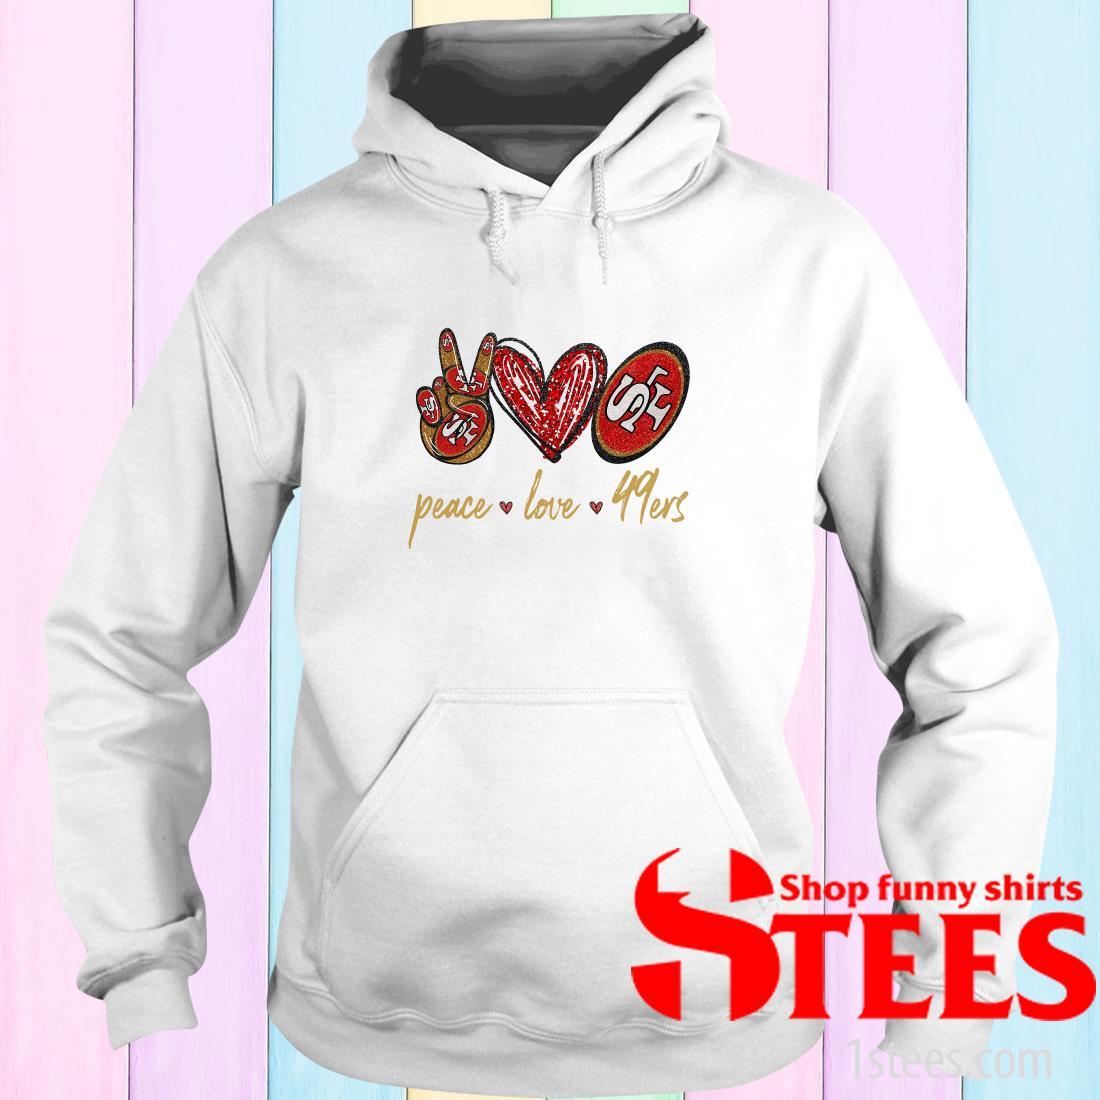 Peace Love San Francisco 49ers Hoodies